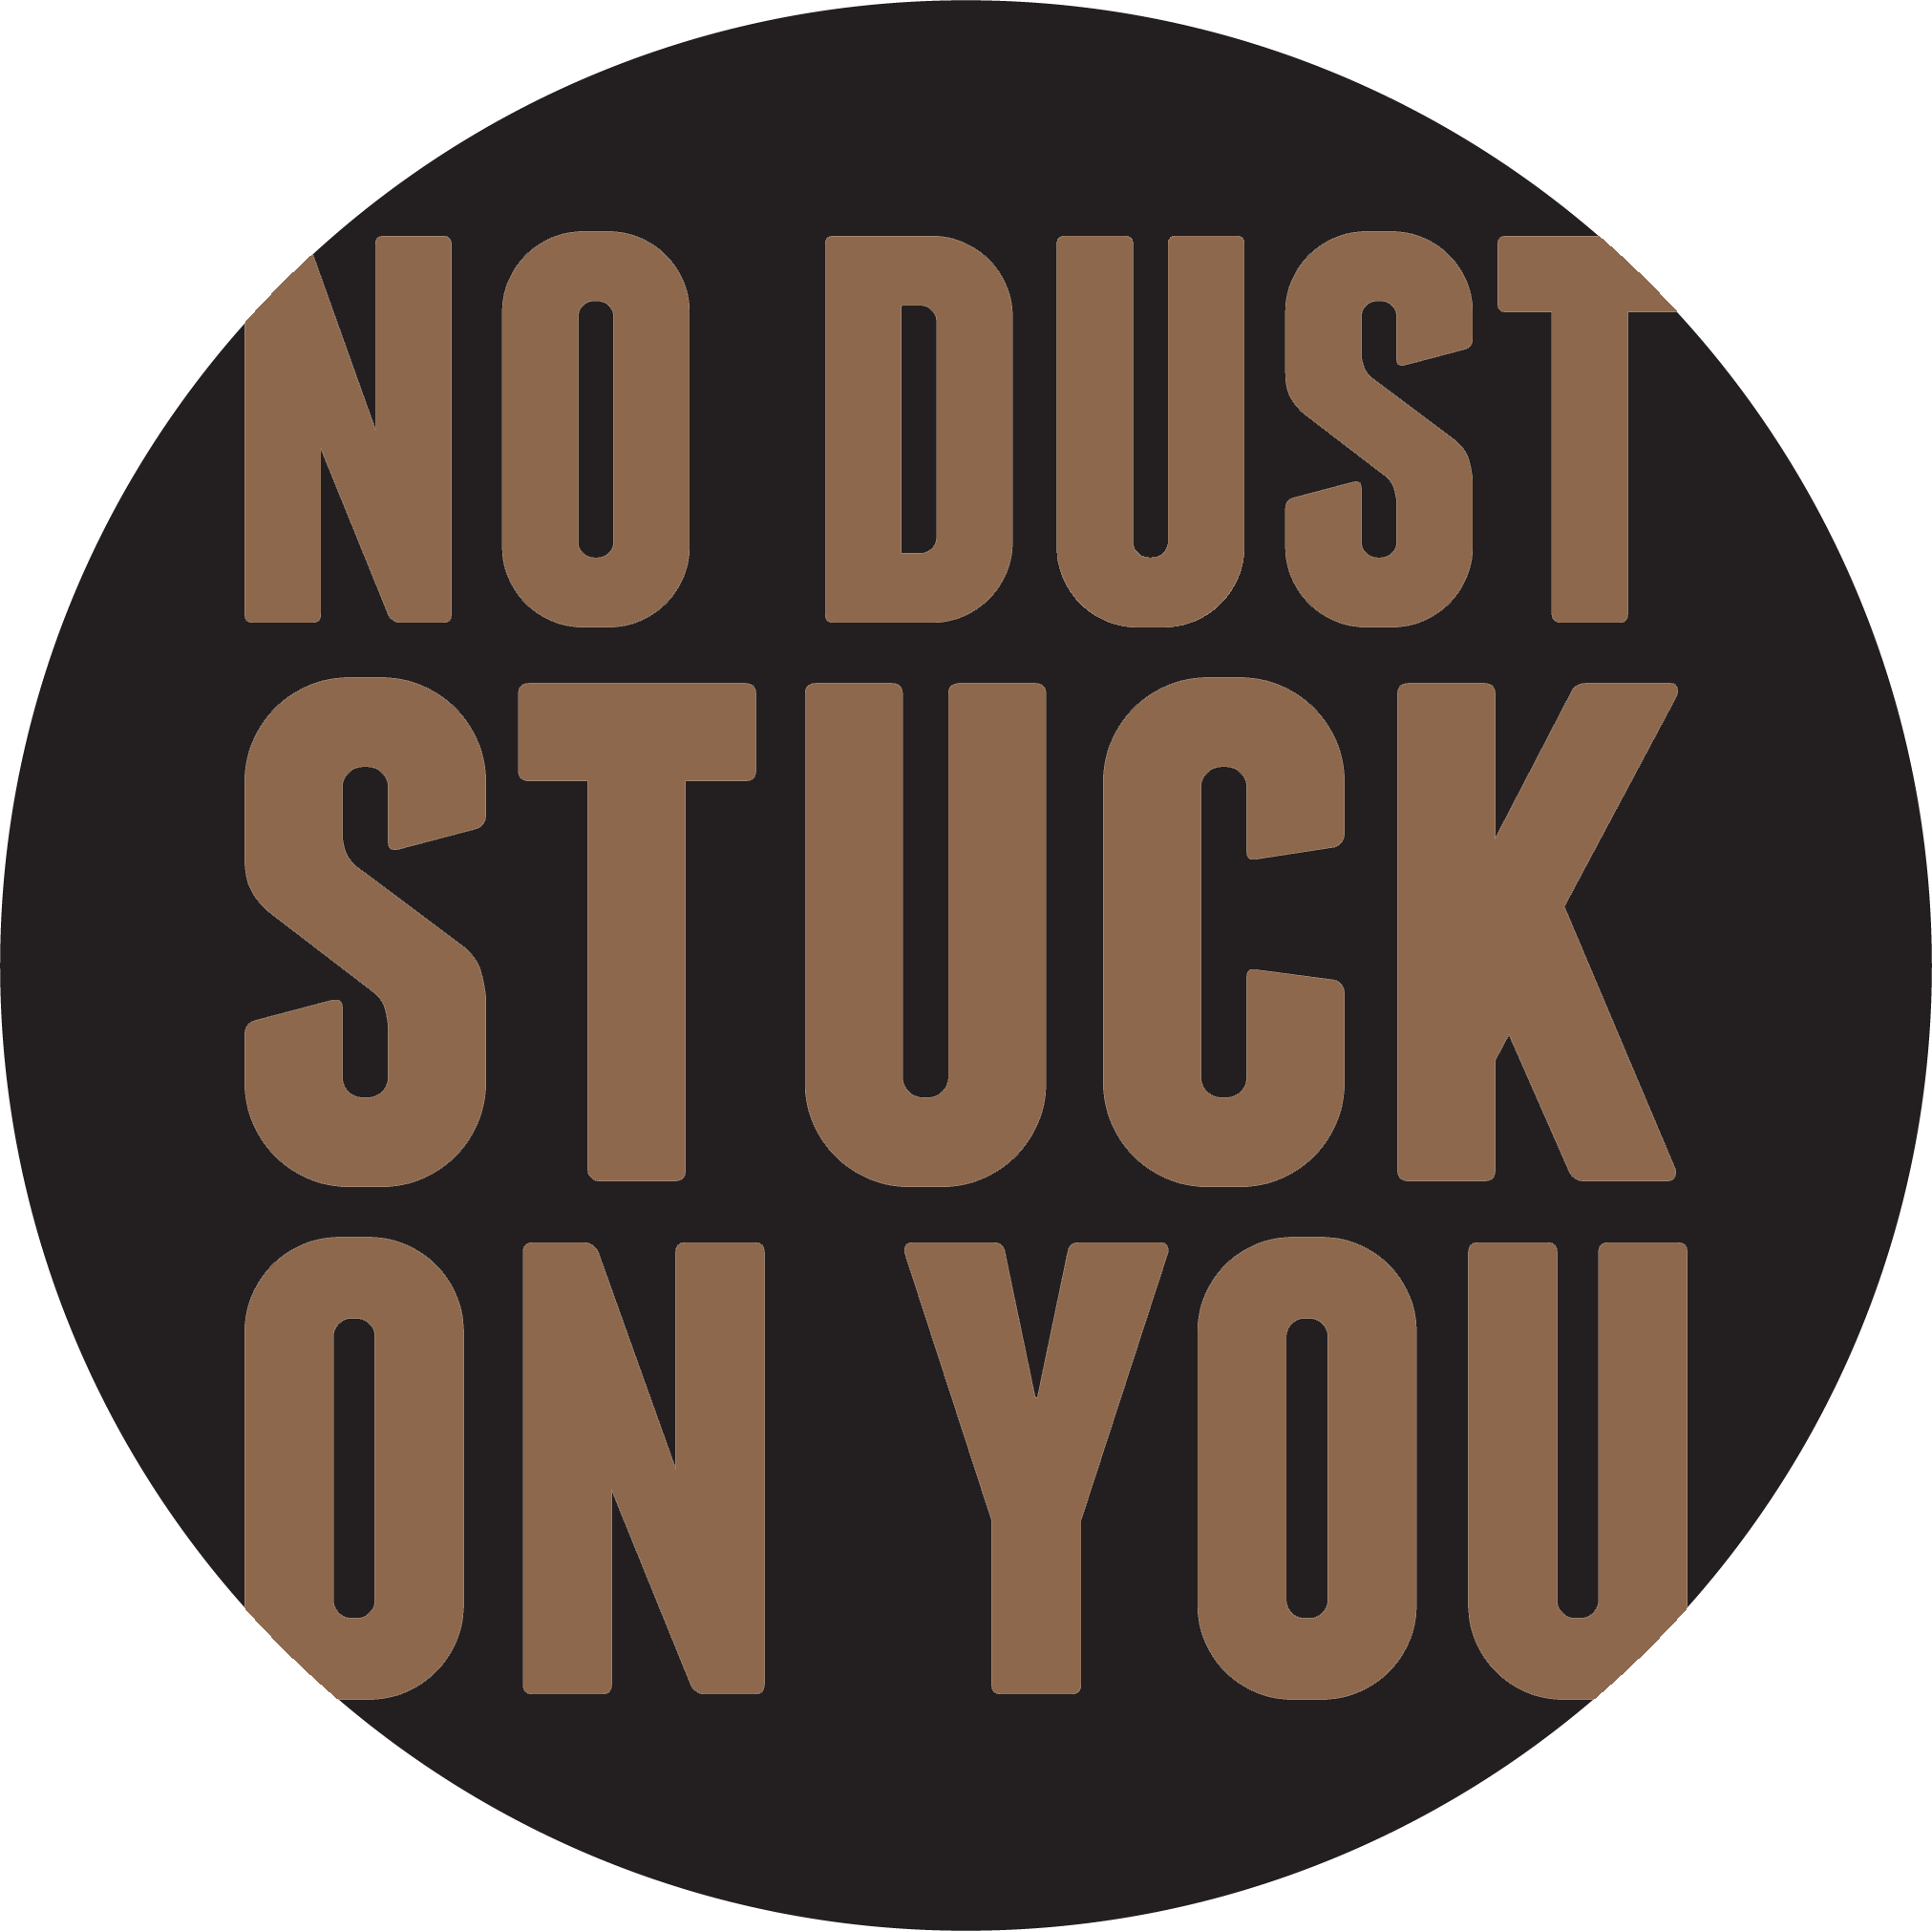 black-drawing-chalks-no-dust-stuck-on-you-cd-2012